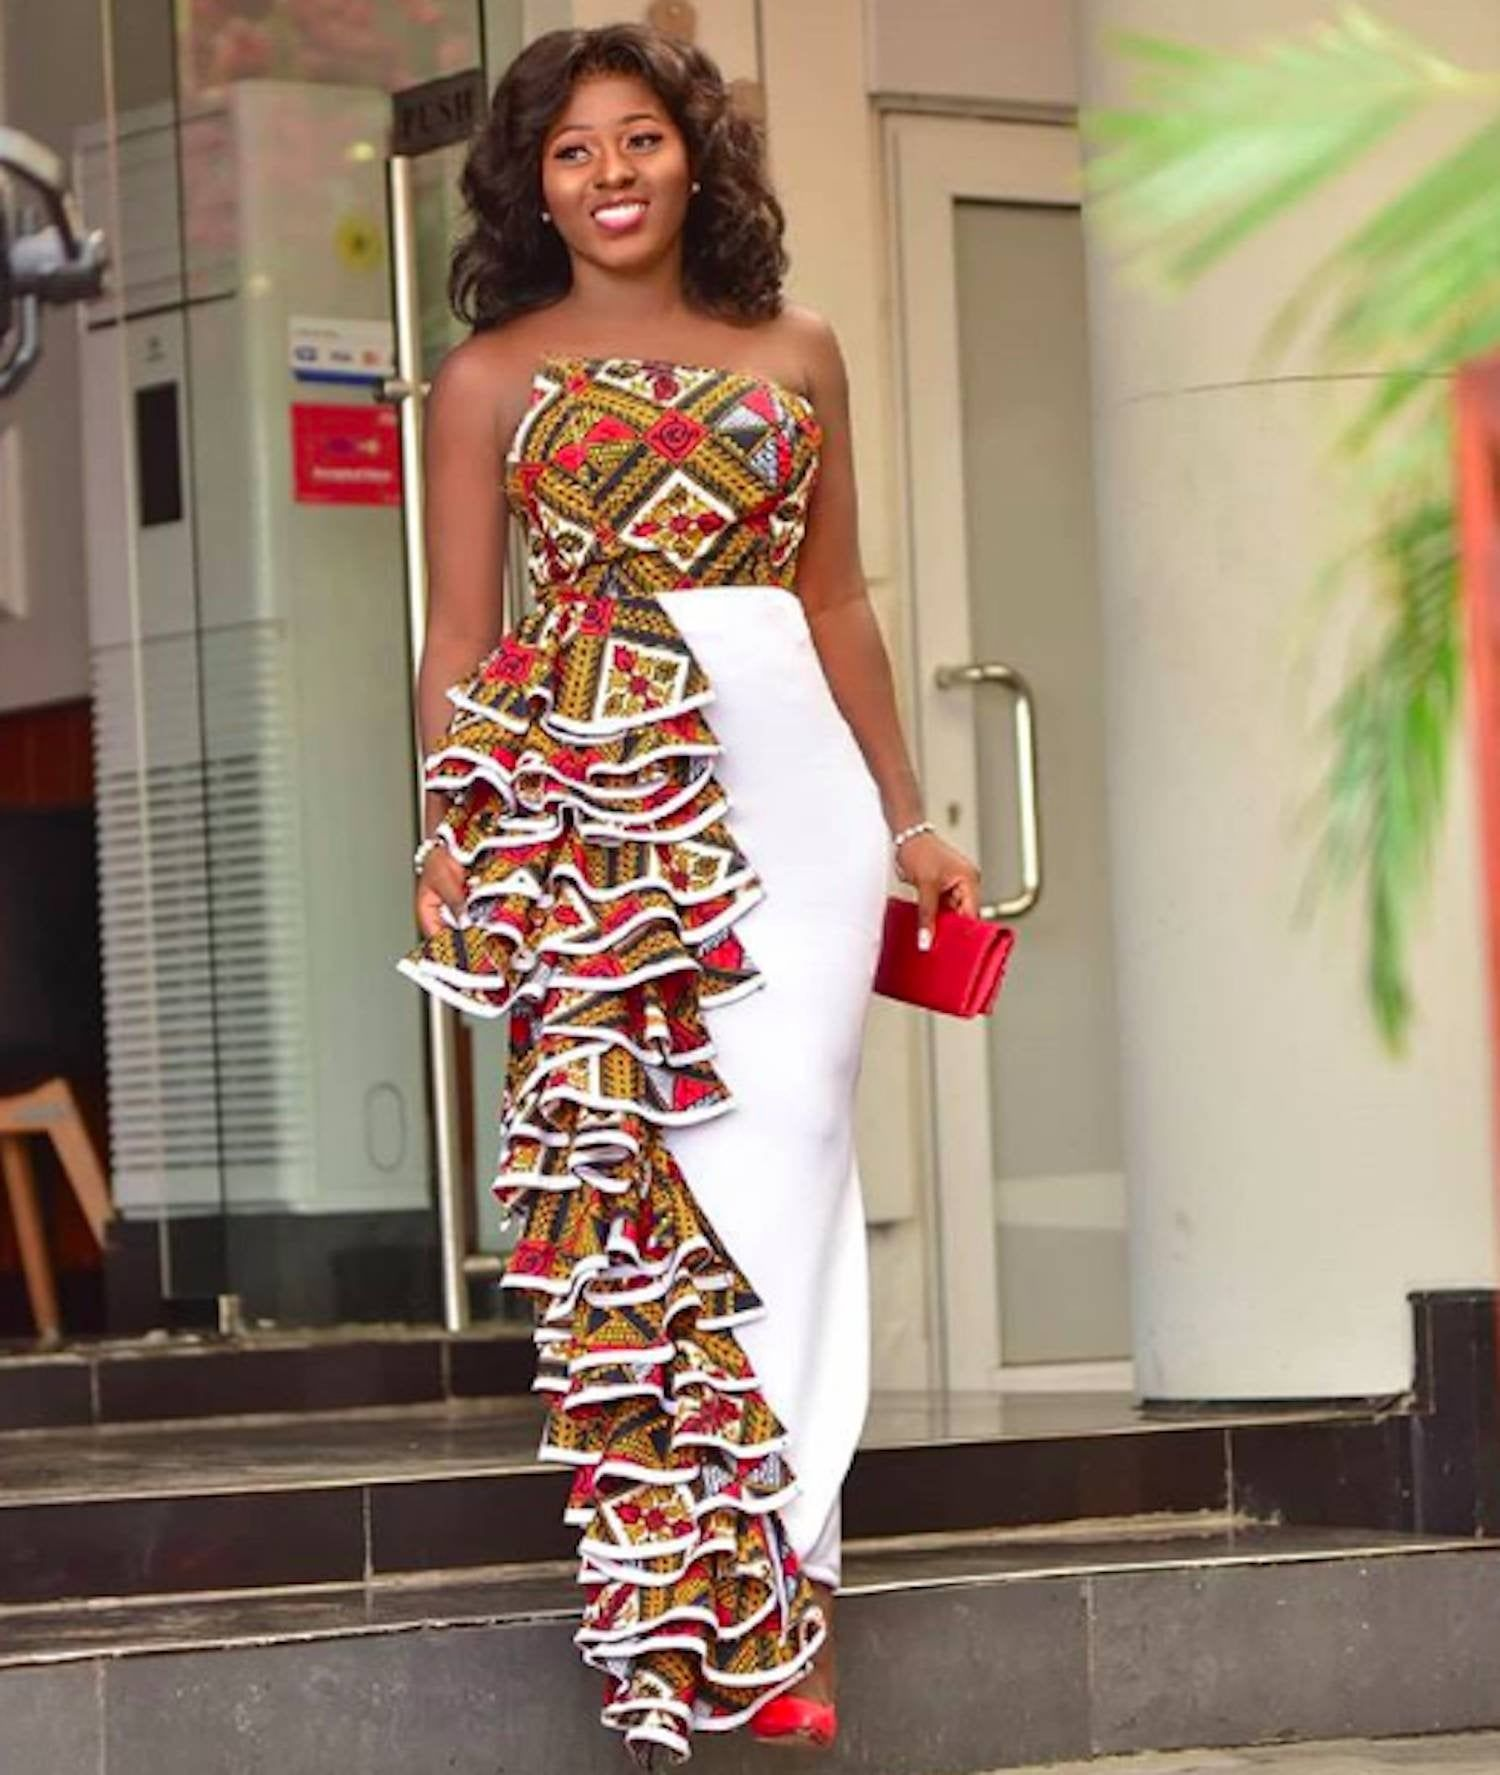 African Print Jumpsuit Strapless Dress - Ankara Print - African Dress - Ankara Dress - Handmade - Af #kitengedesigns